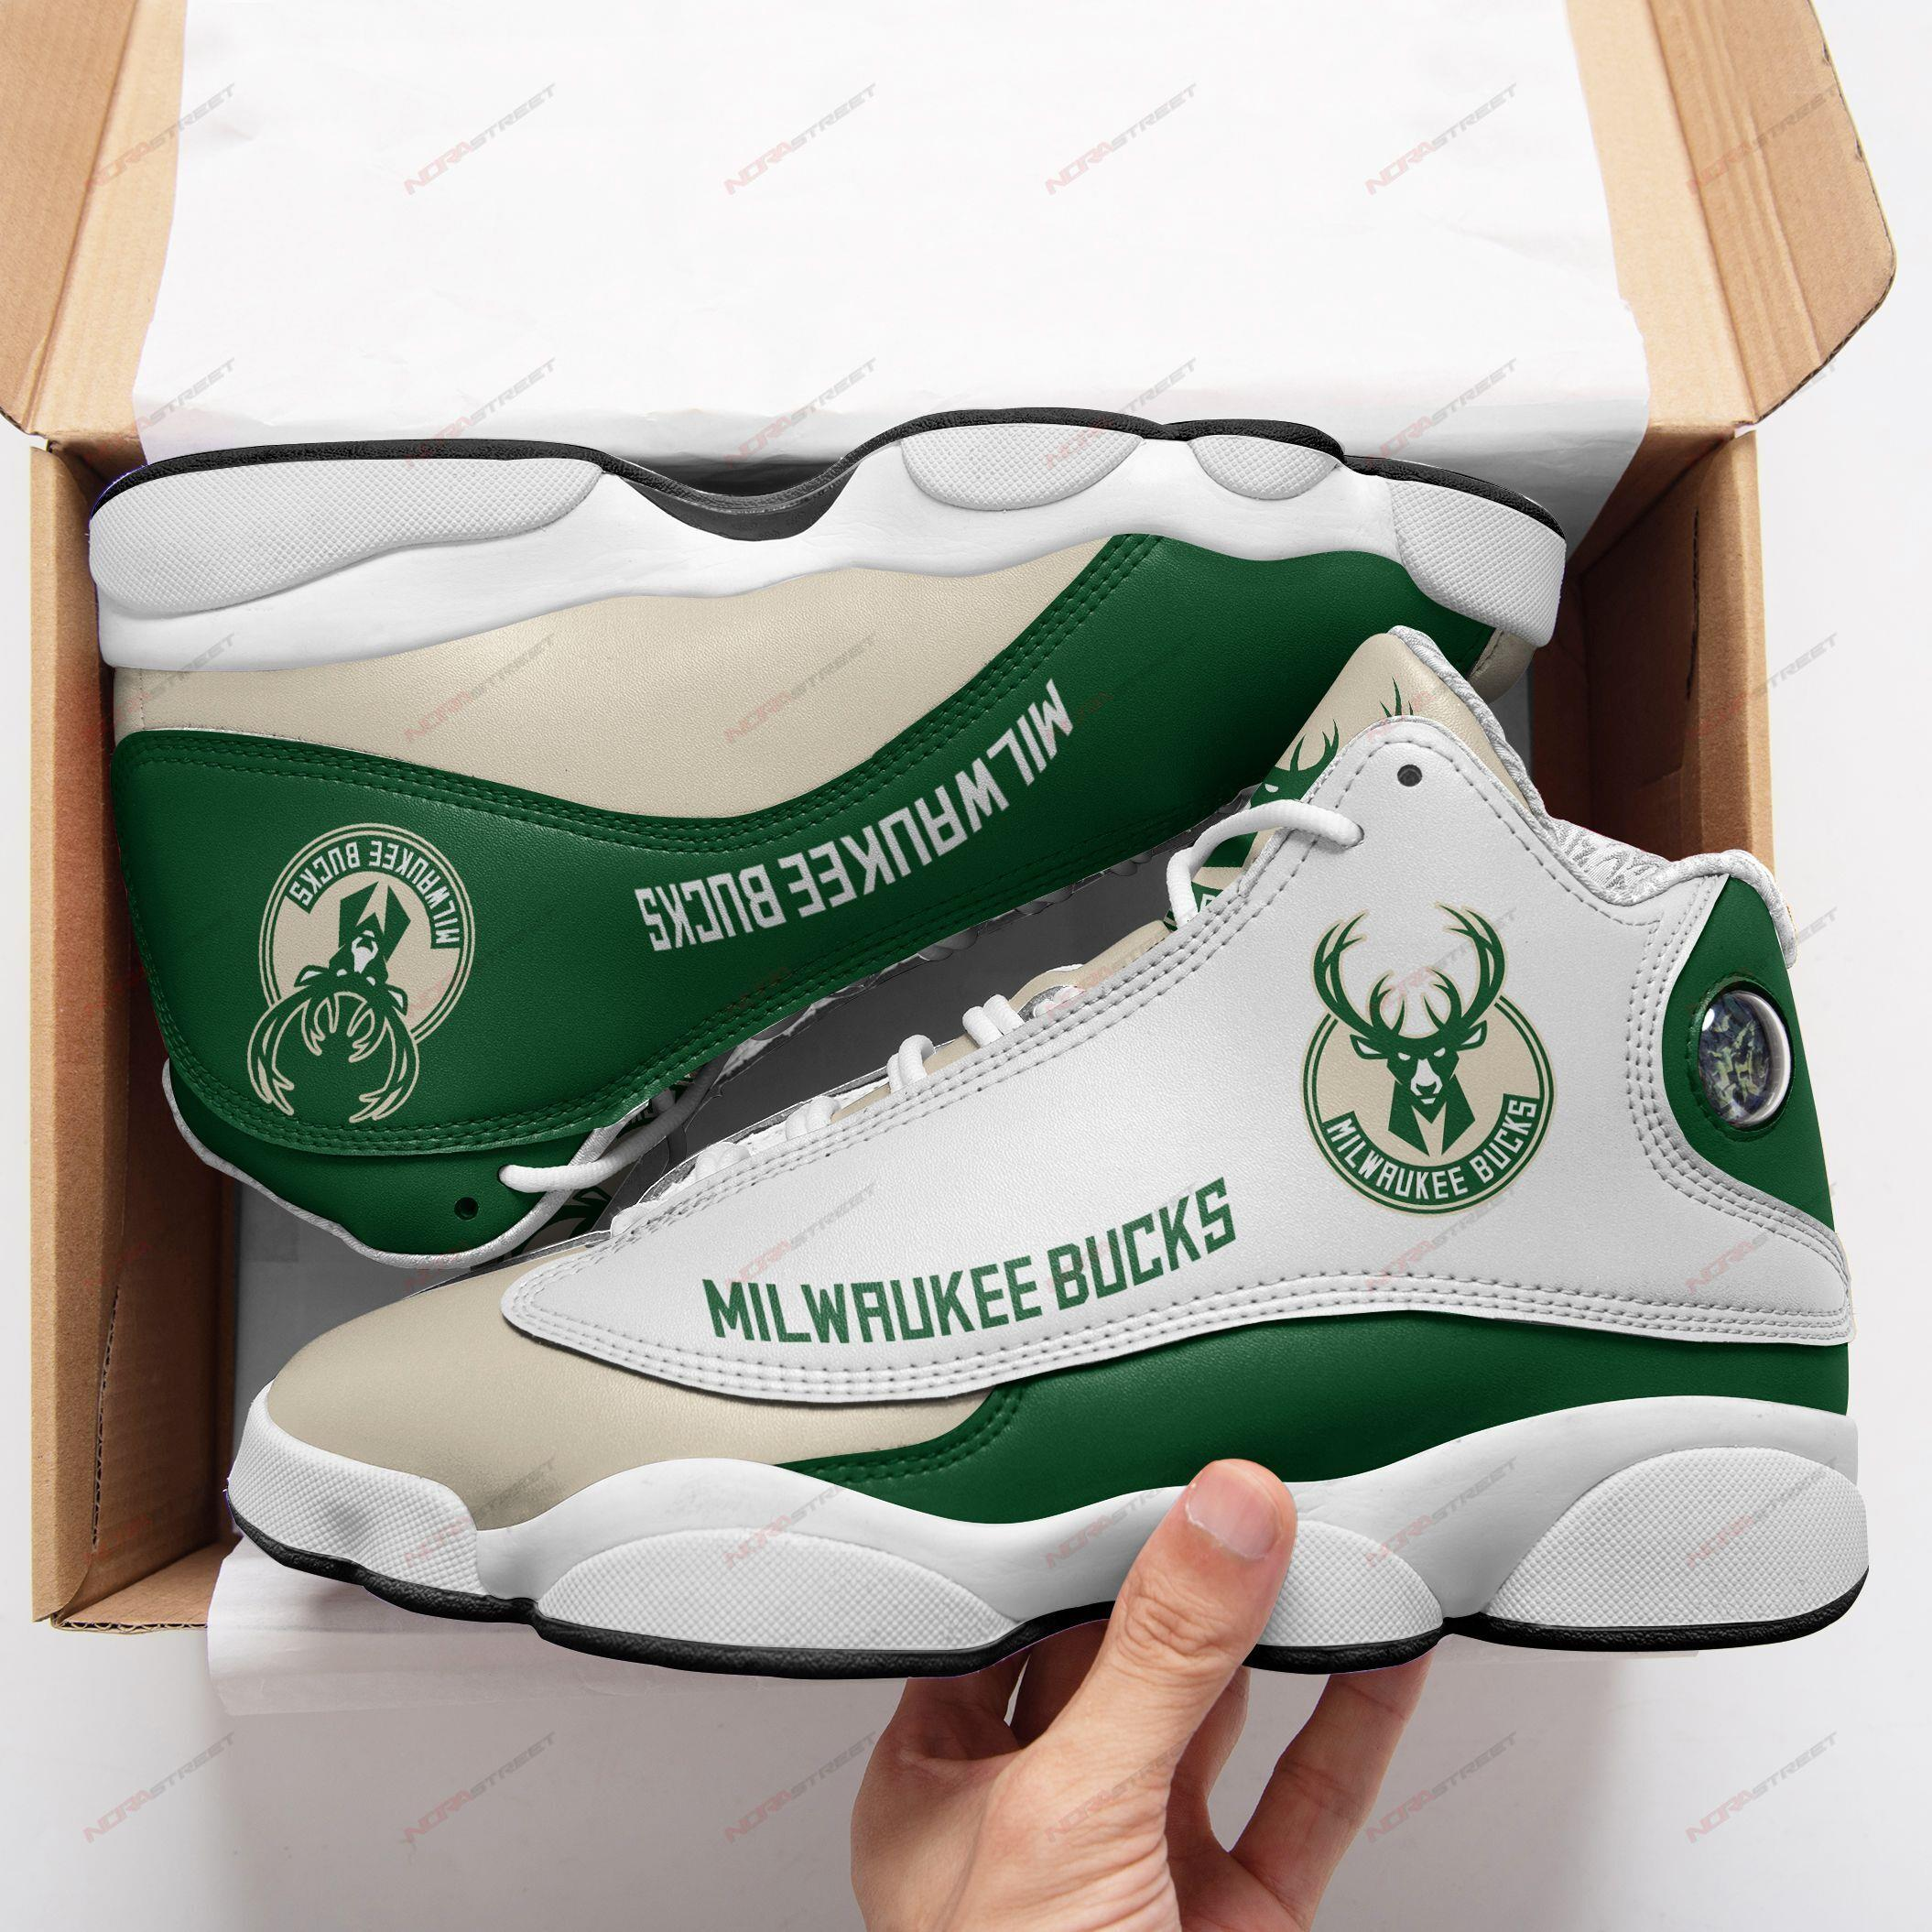 Milwaukee Bucks Air Jordan 13 Sneakers Sport Shoes